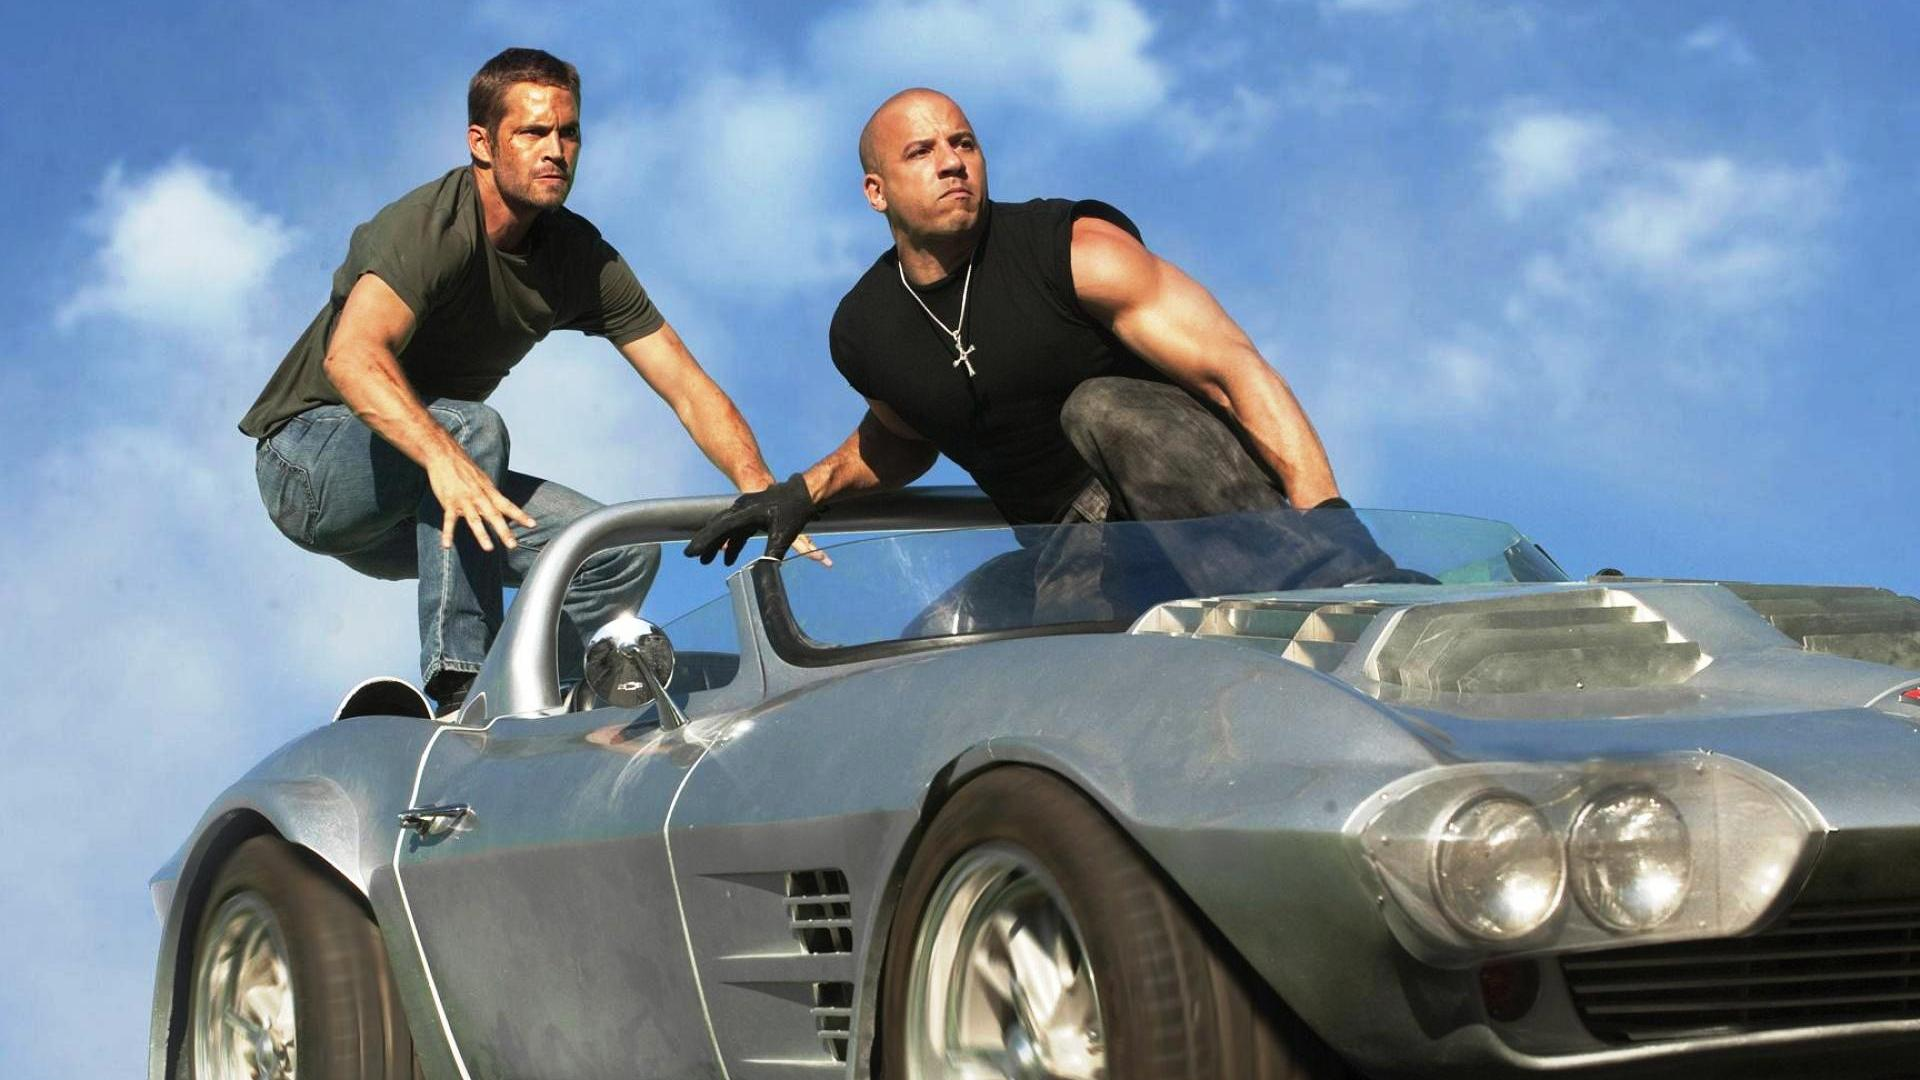 Download Wallpaper 1920x1080 Paul Walker And Vin Diesel In Fast Furious 6